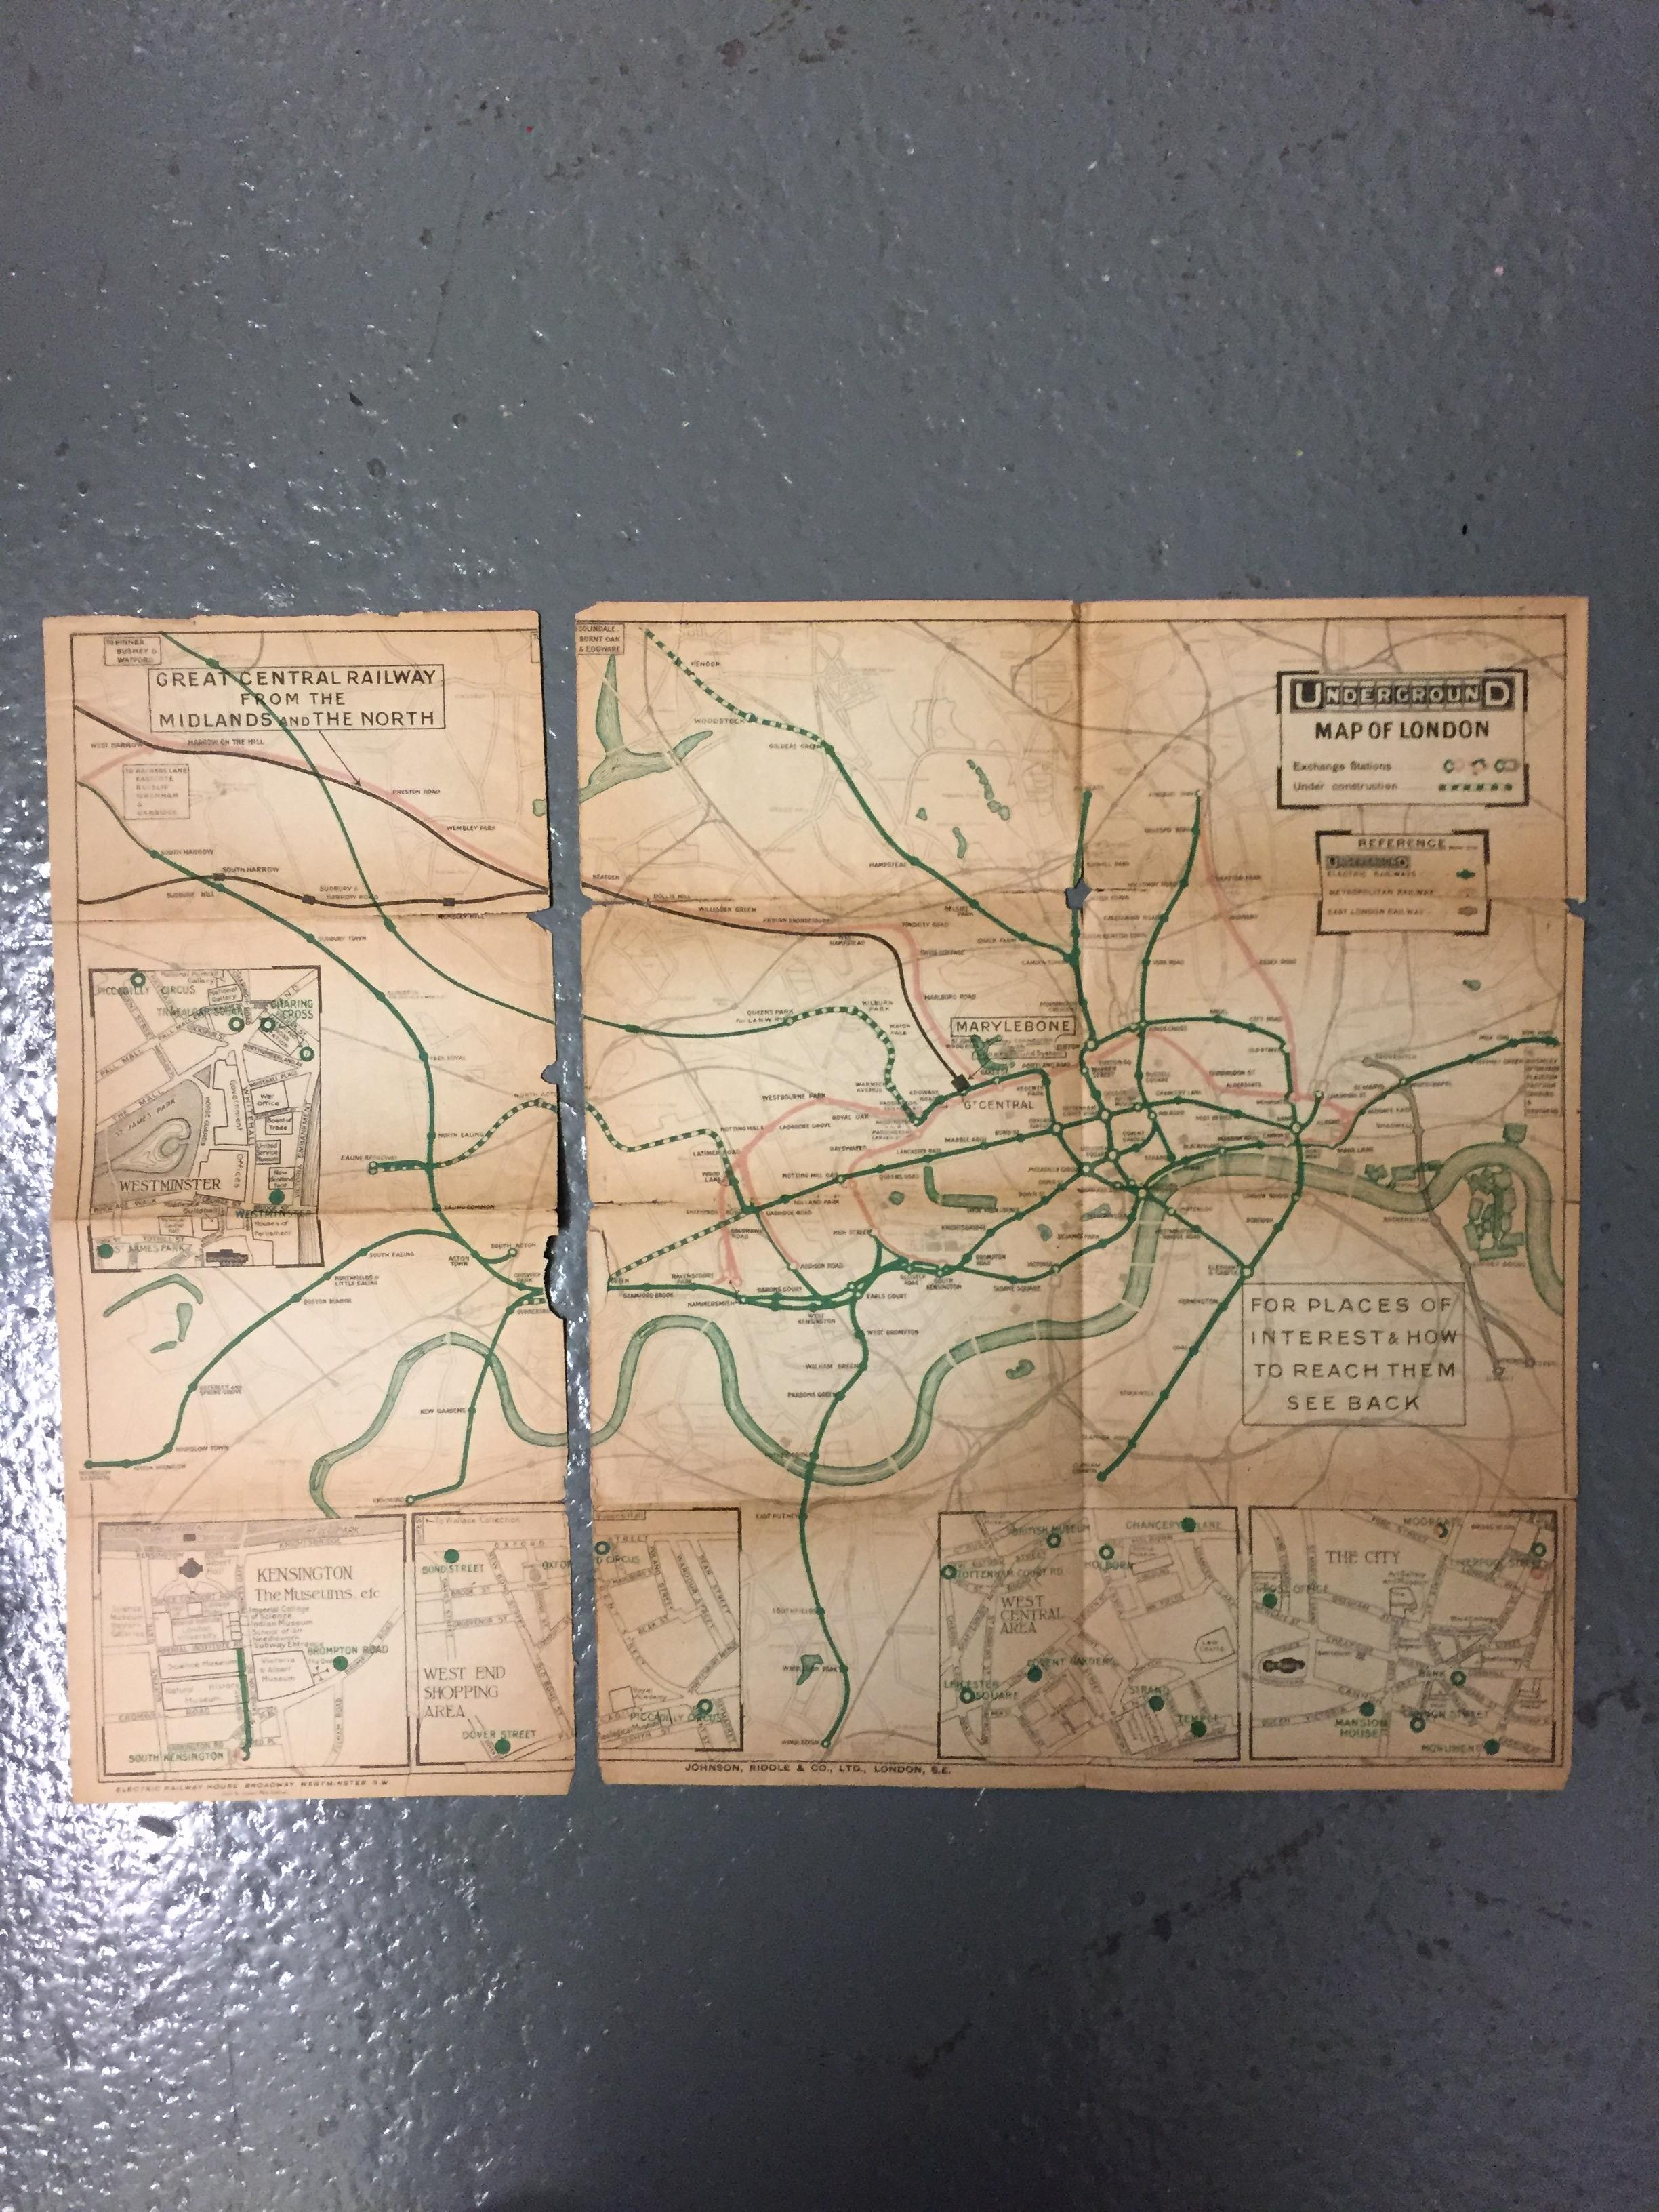 Nine 1910/20s folding pocket maps for London transport,comprising a 1916 General Omnibus Map of some - Image 7 of 15